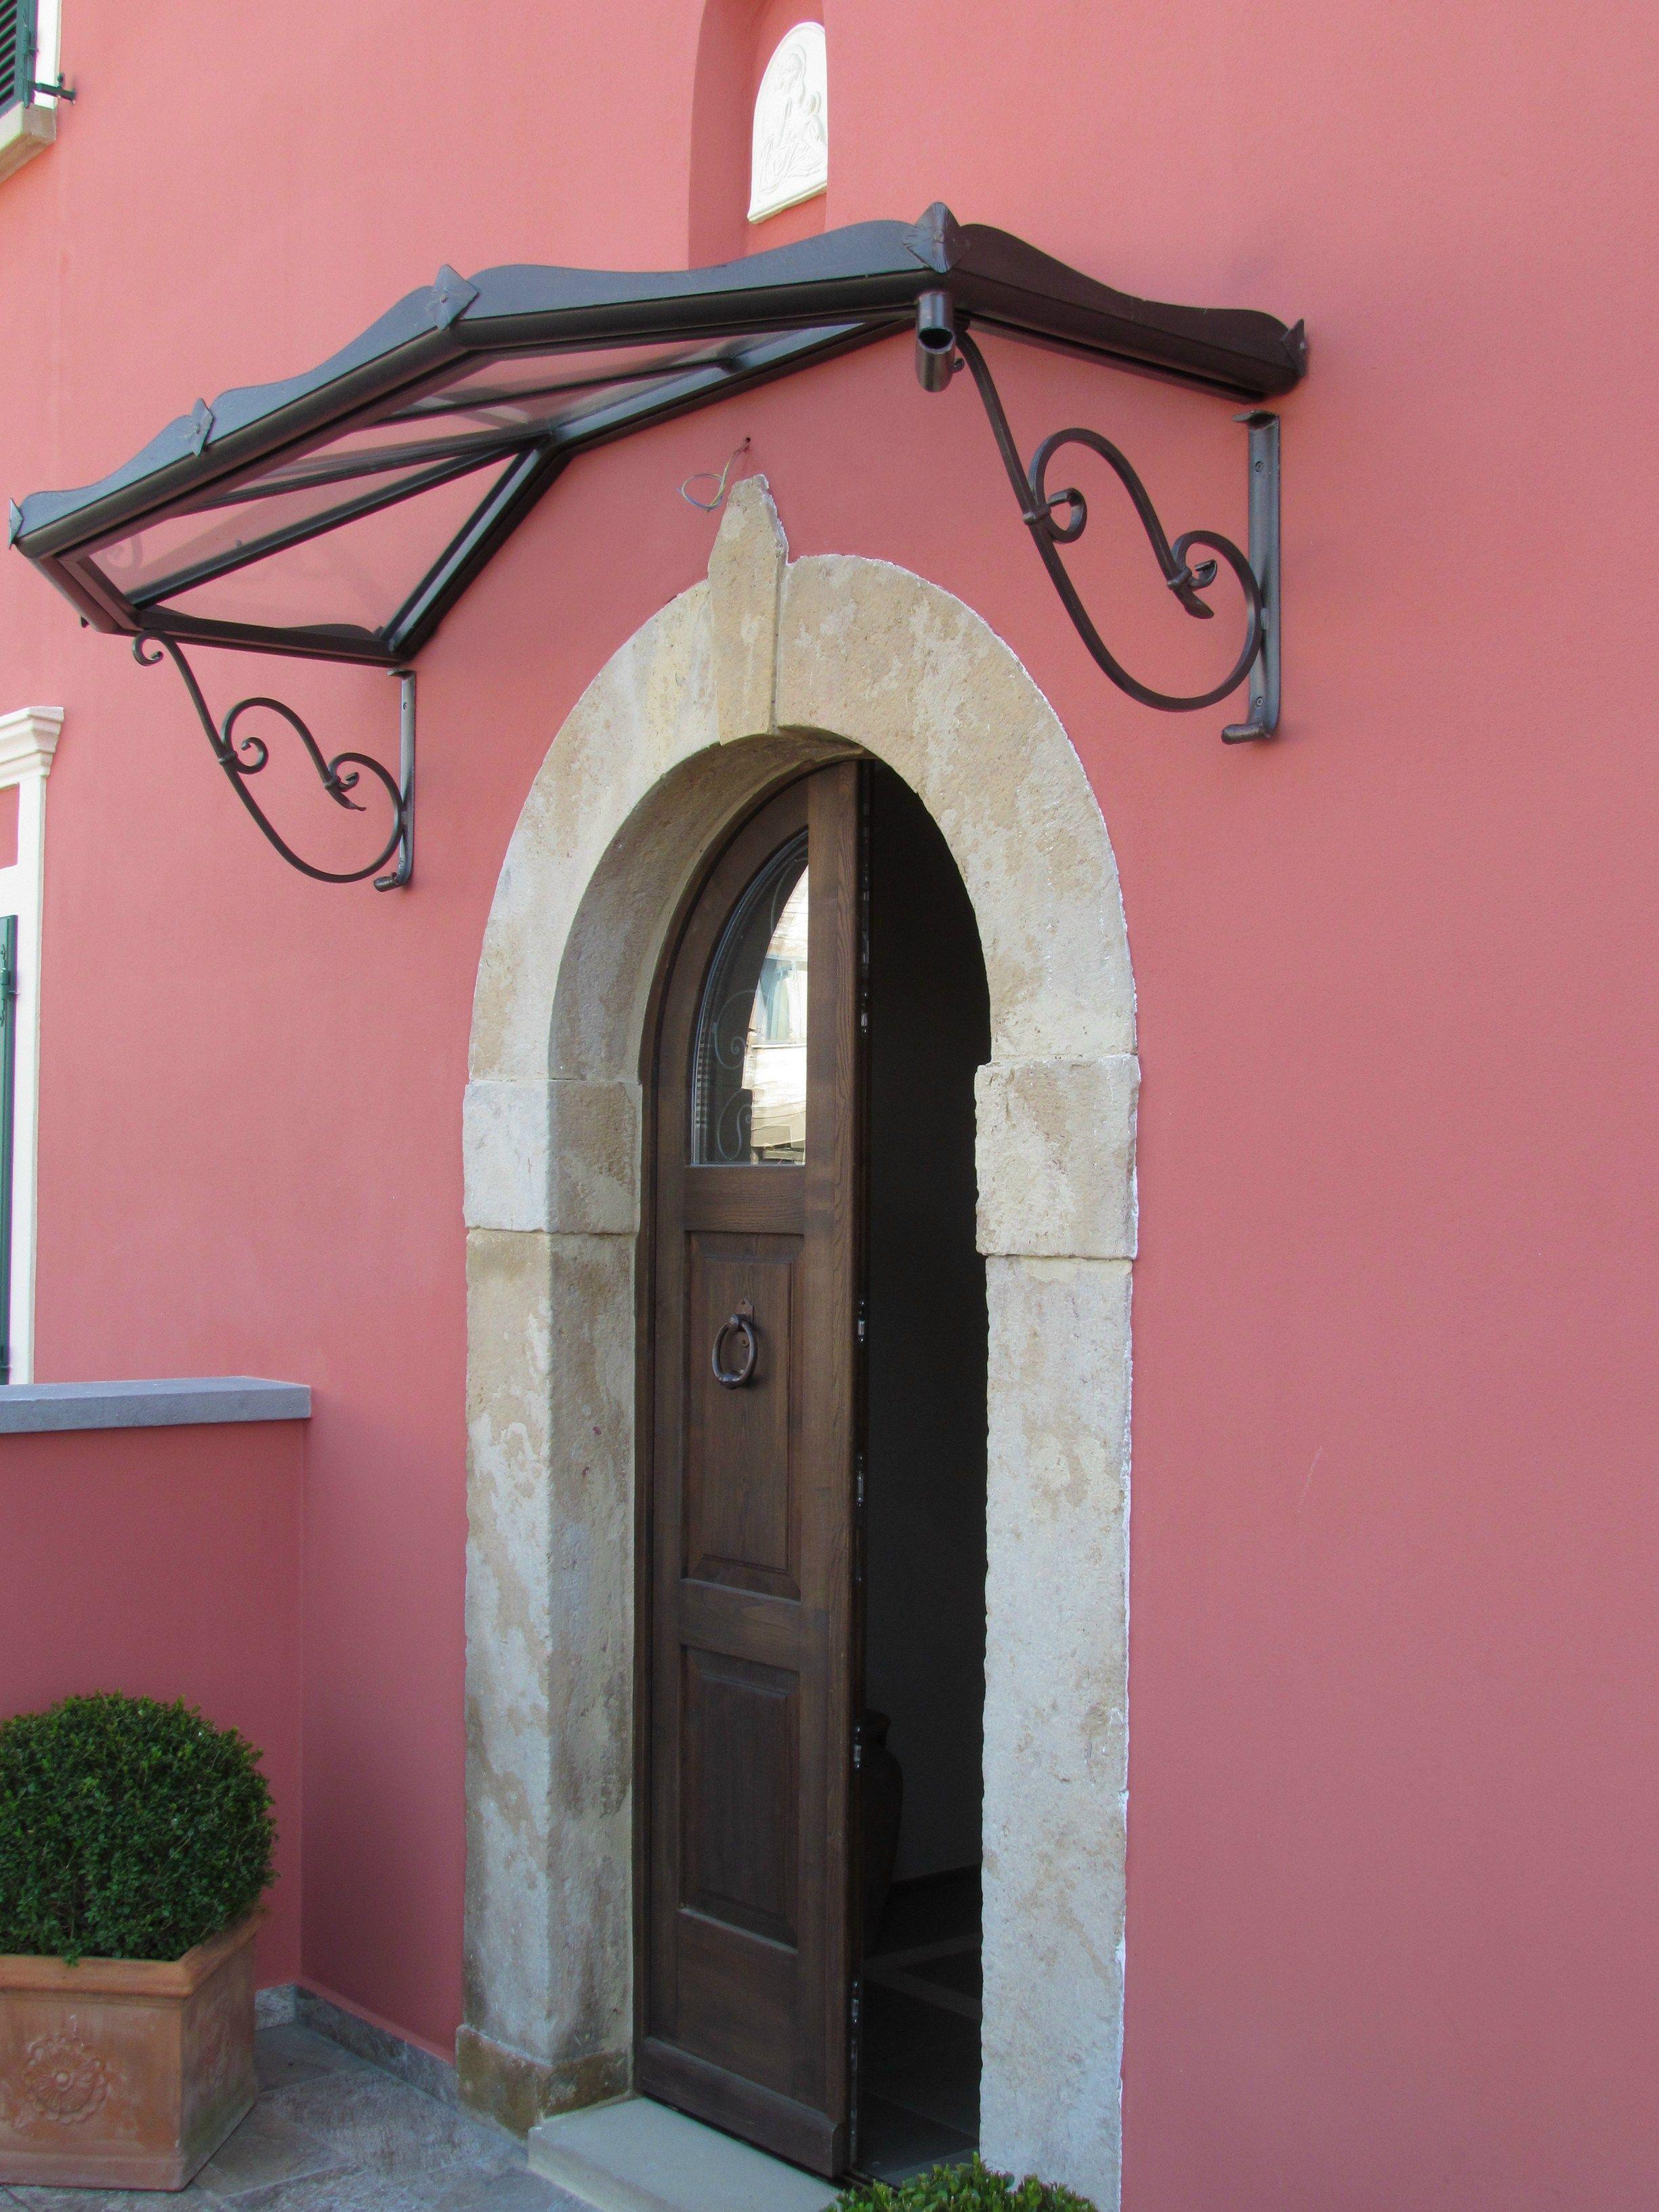 Porte D 39 Entr E Avec Marquise En Fer Garden House Lazzerini Basileek Marquise Ch Ssis